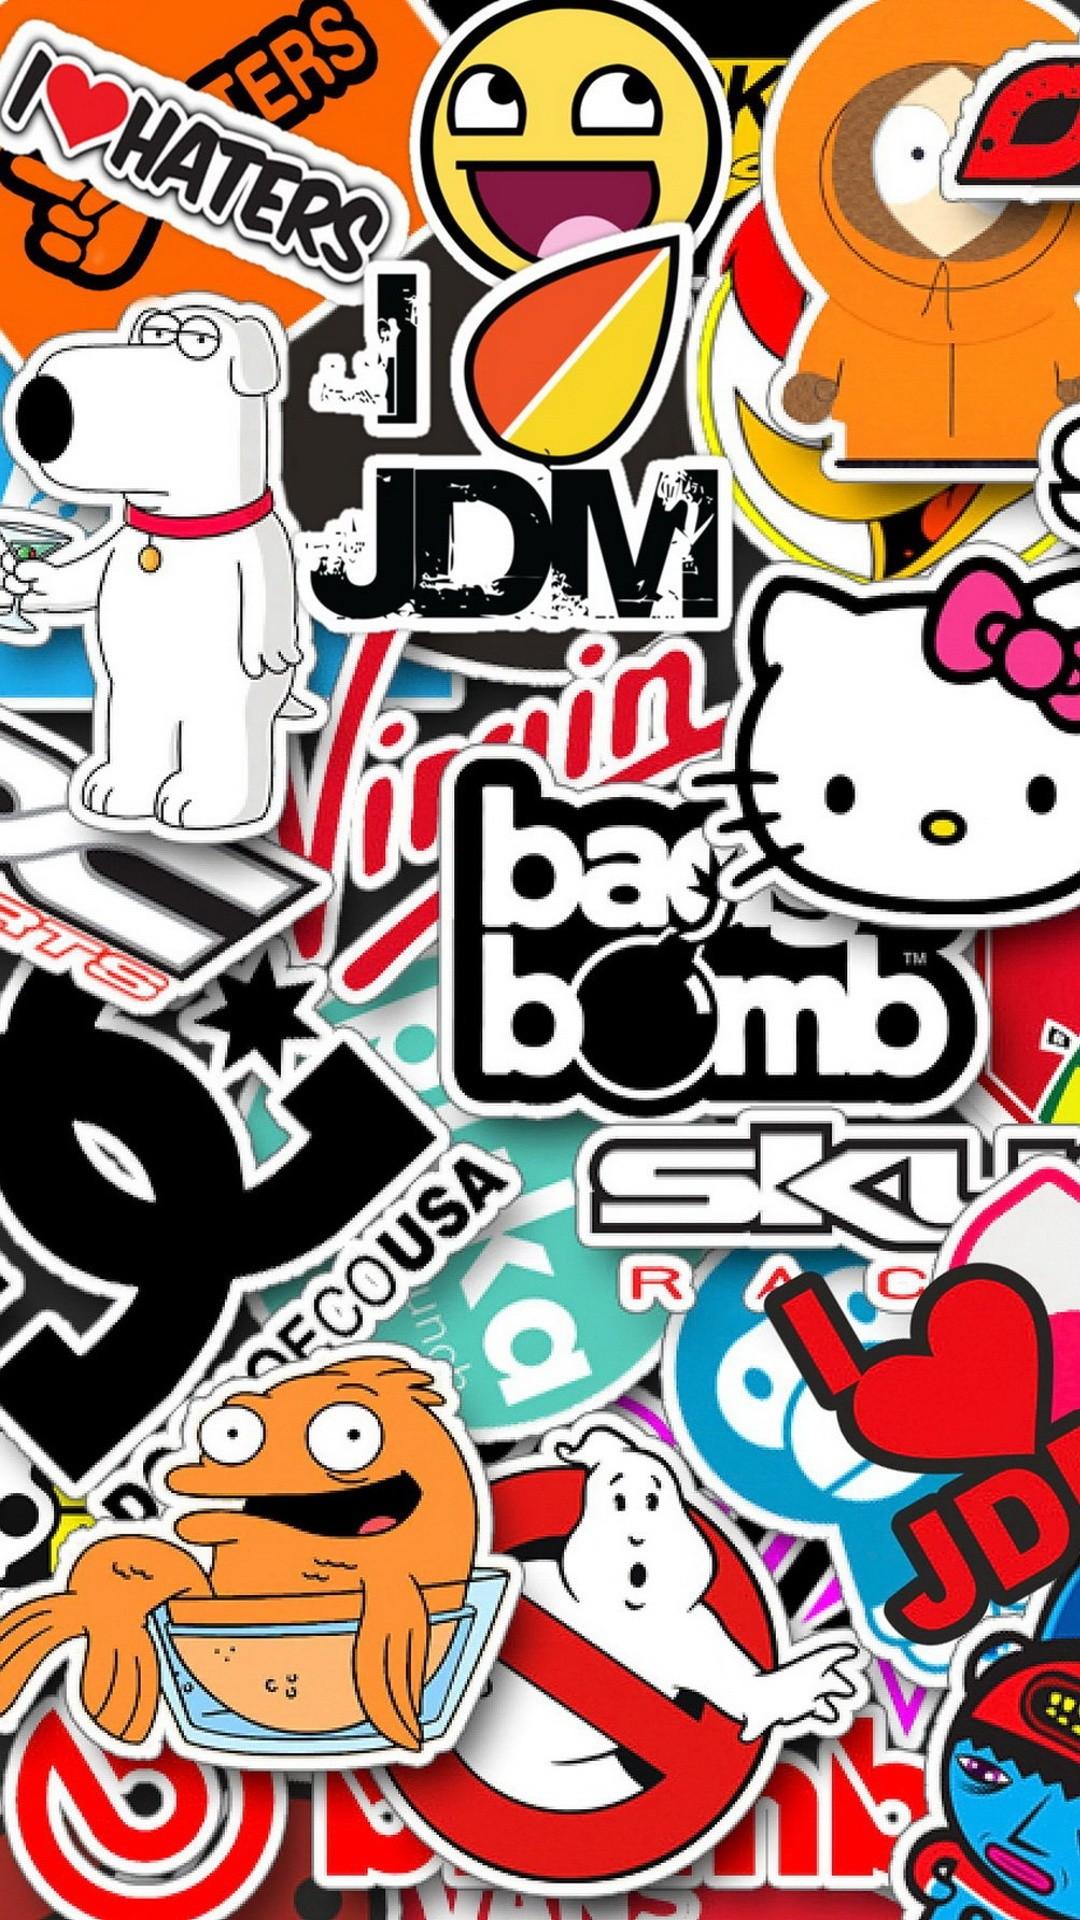 Sticker Bomb Wallpaper Hd 63 Images